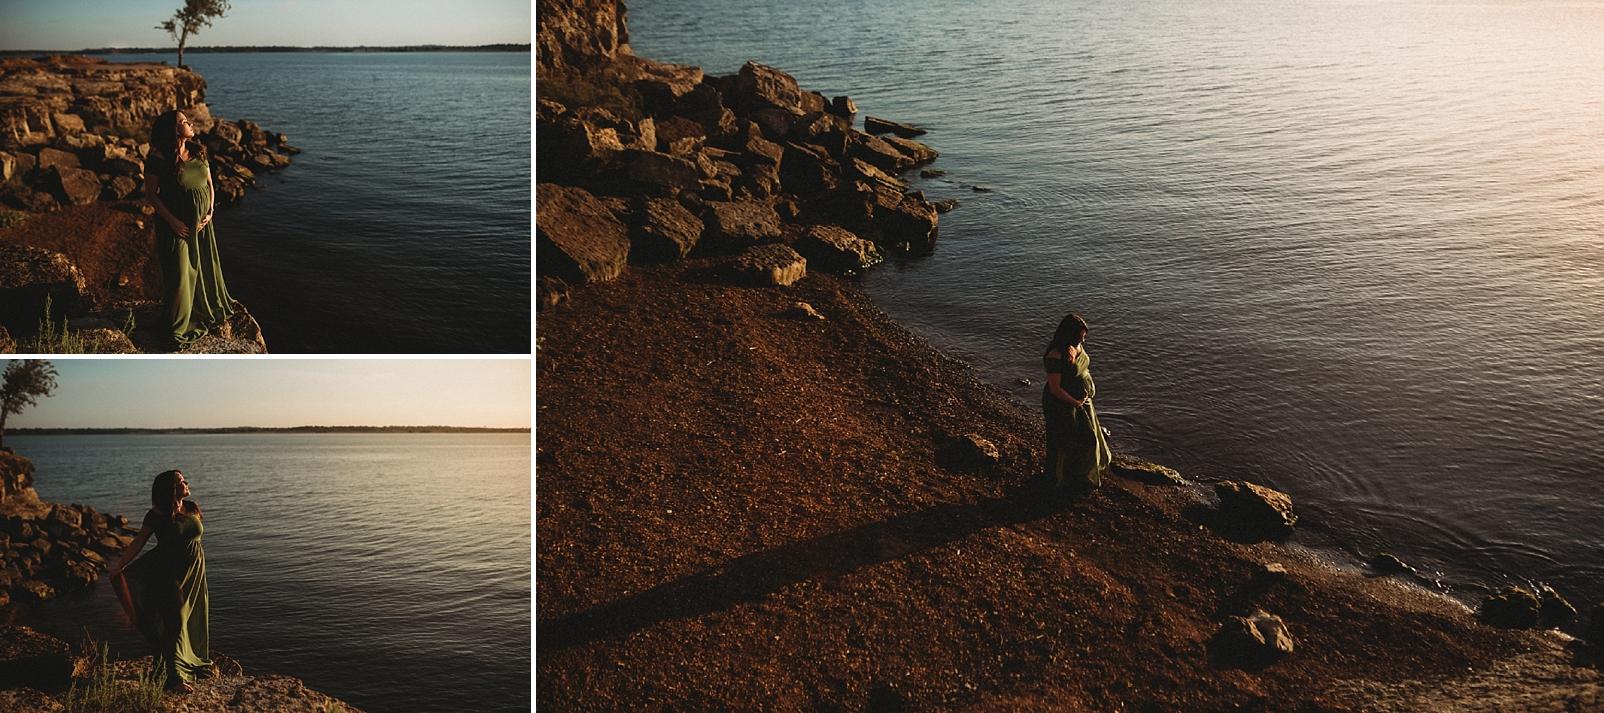 twyla jones photography - www.twylajones.com - sunset family maternity photoshoot dallas texas lake-TDJ_9389.jpg